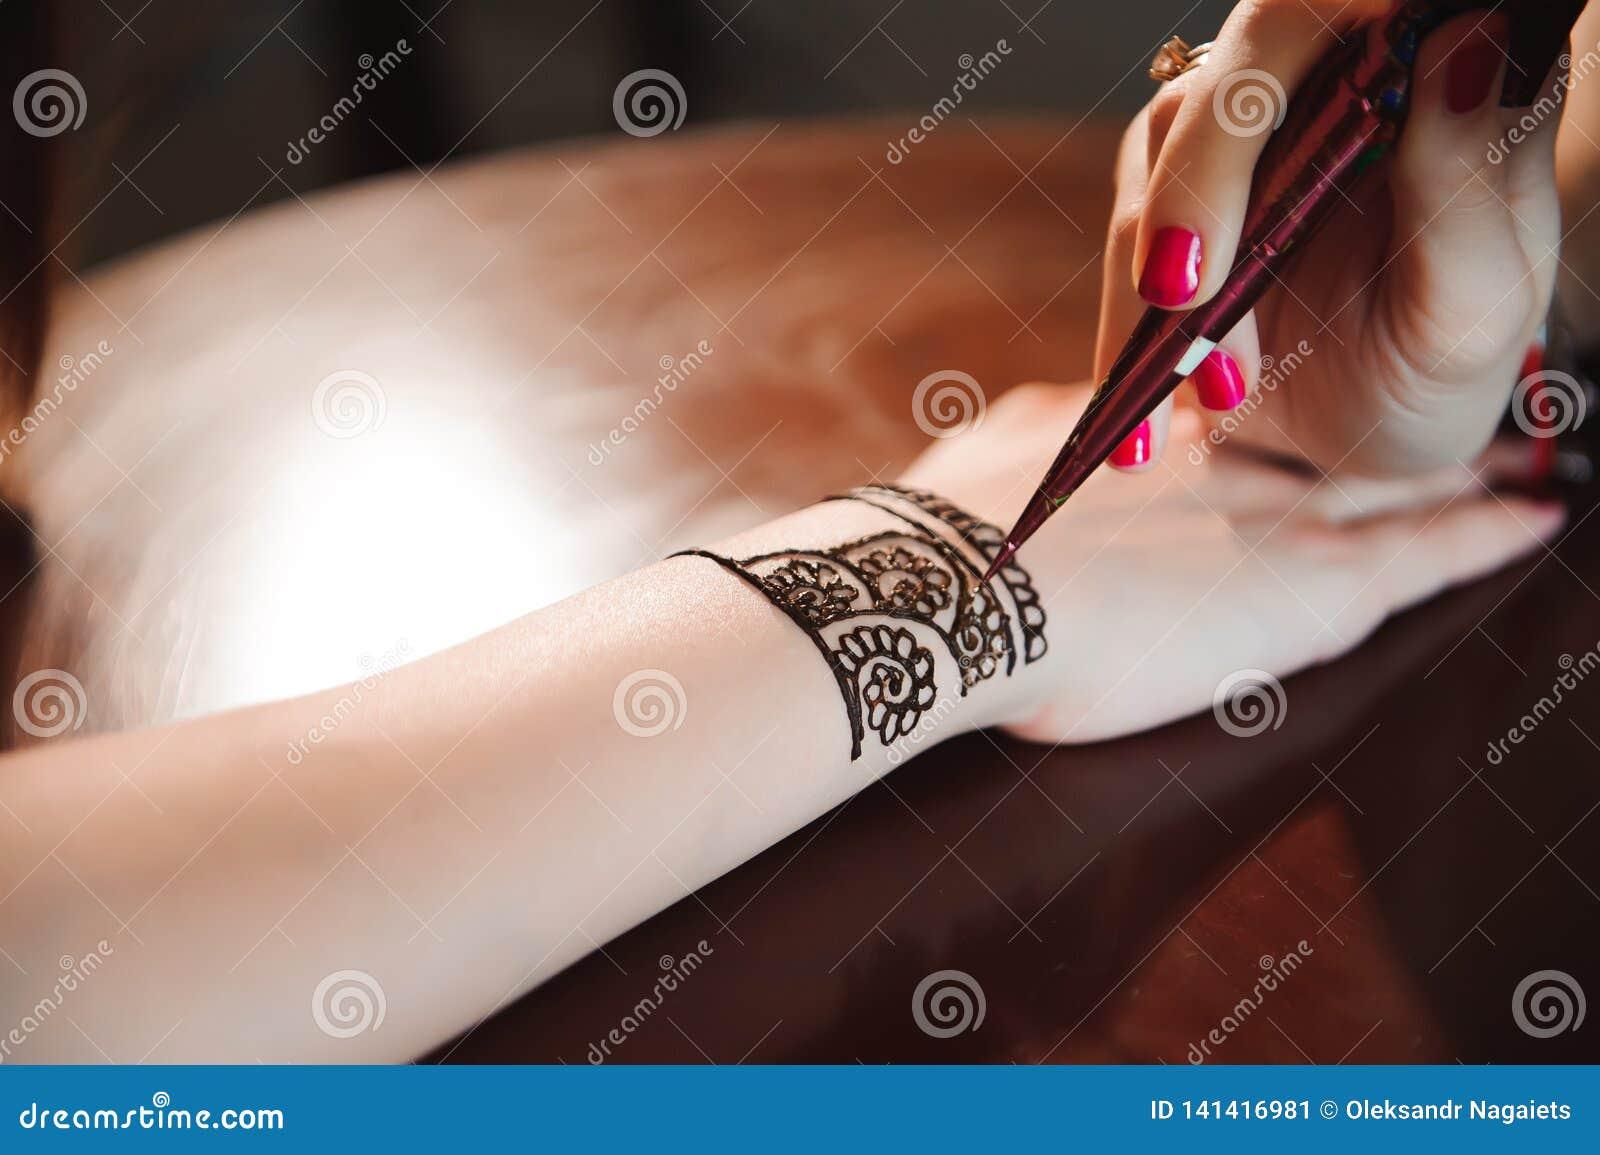 Artist applying henna tattoo on women hands. Mehndi is traditional Indian decorative art.